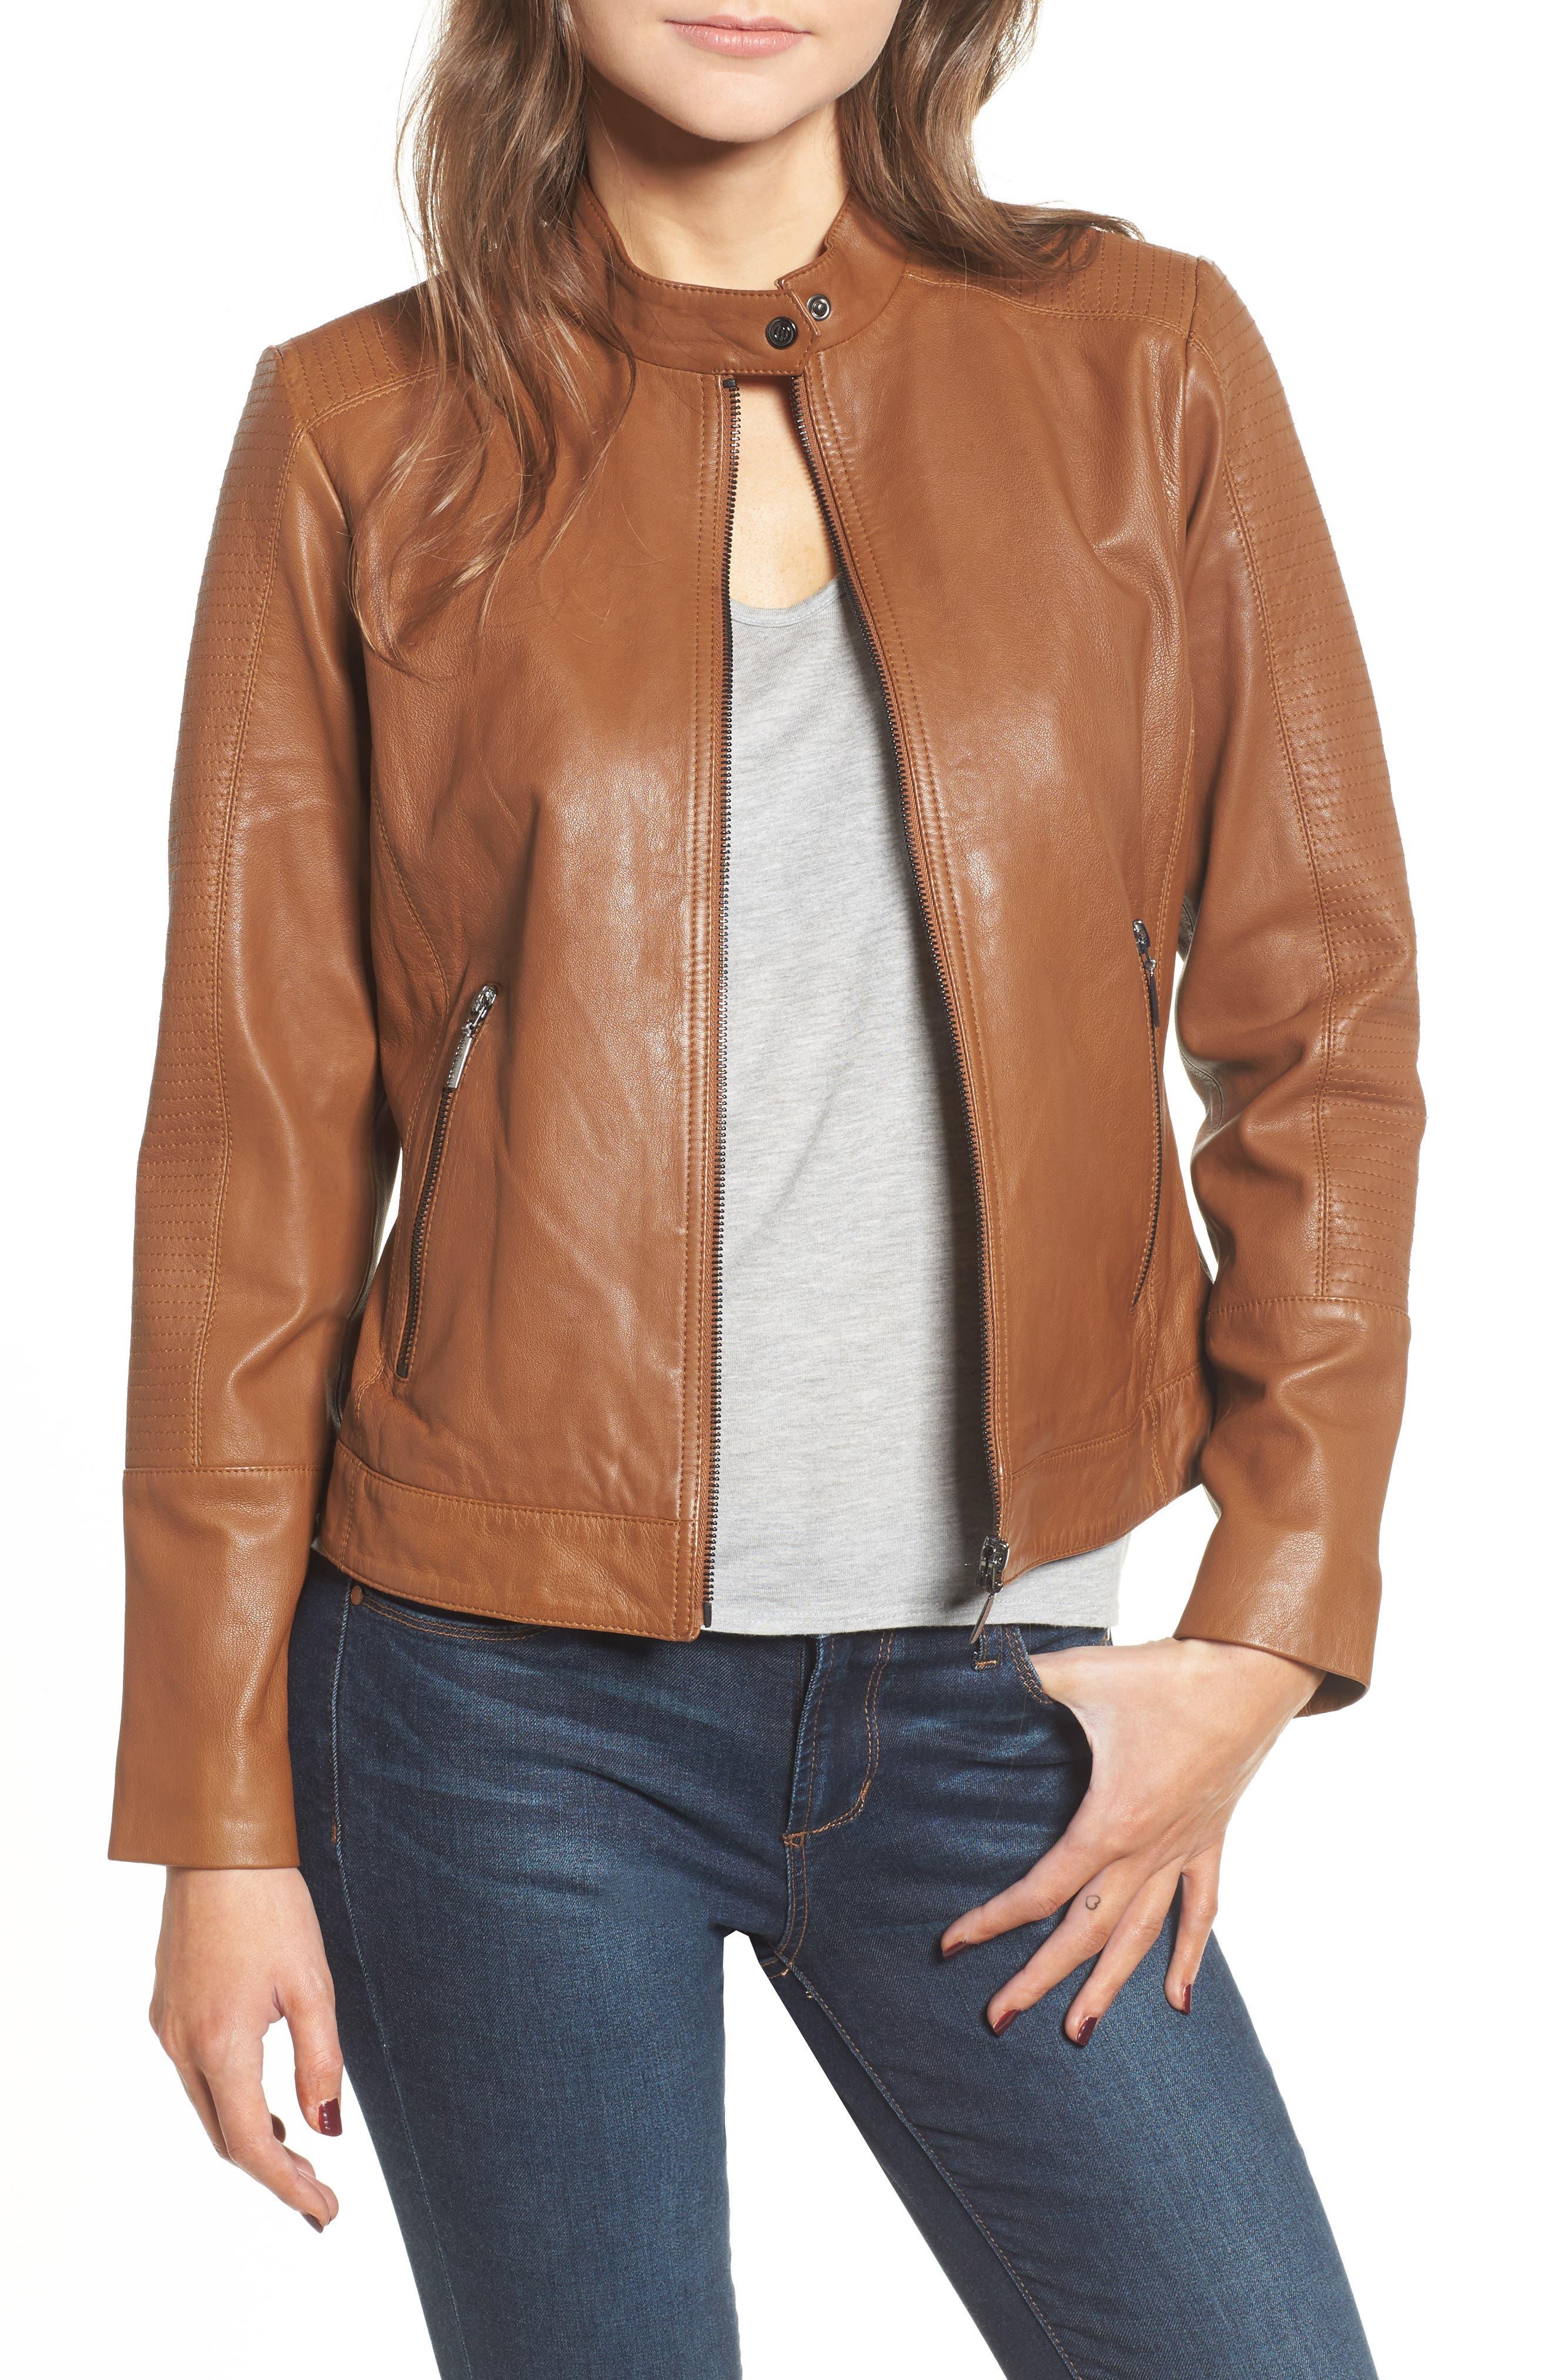 Kirwin Leather Moto Jacket,                             Main thumbnail 1, color,                             Pecan